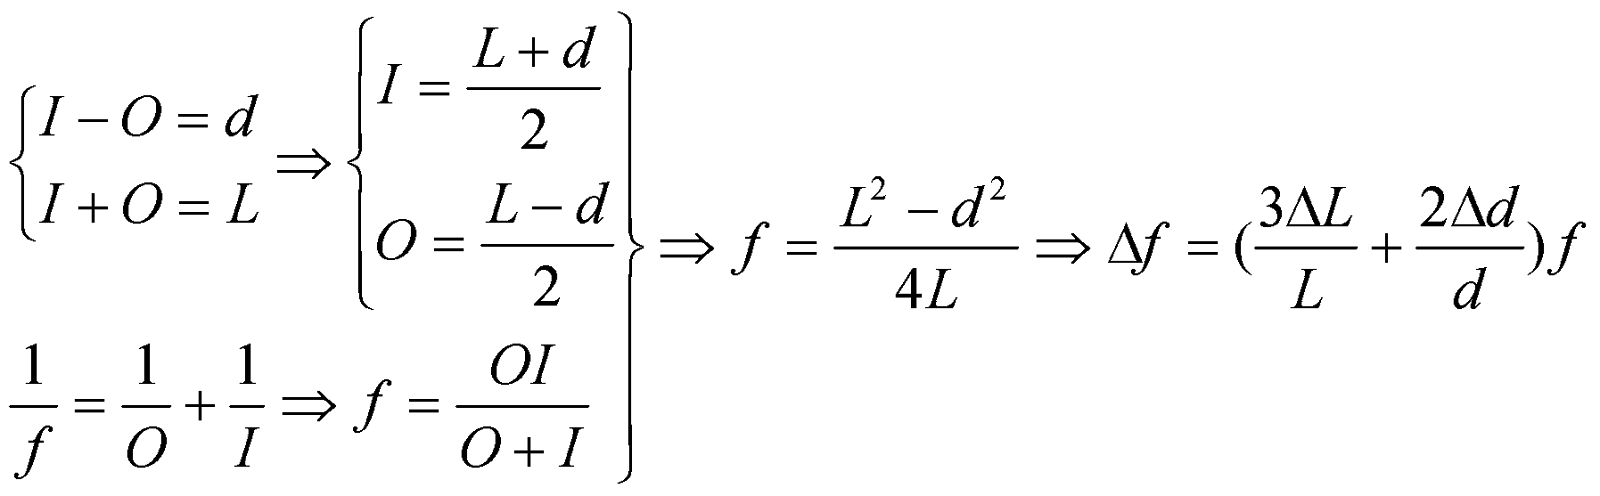 image16.png